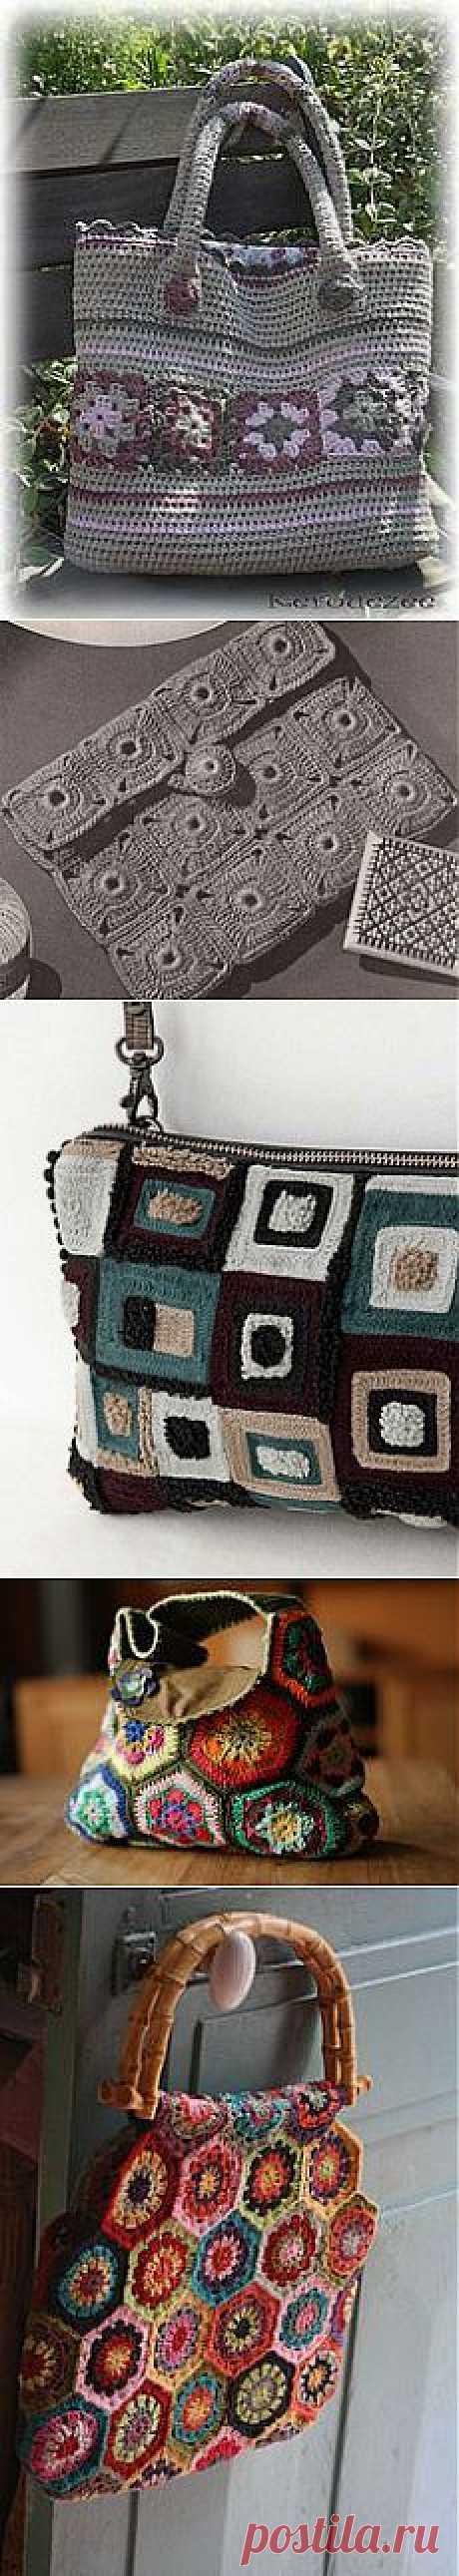 Bags, purses and etc. - squares and etc. в Pinterest